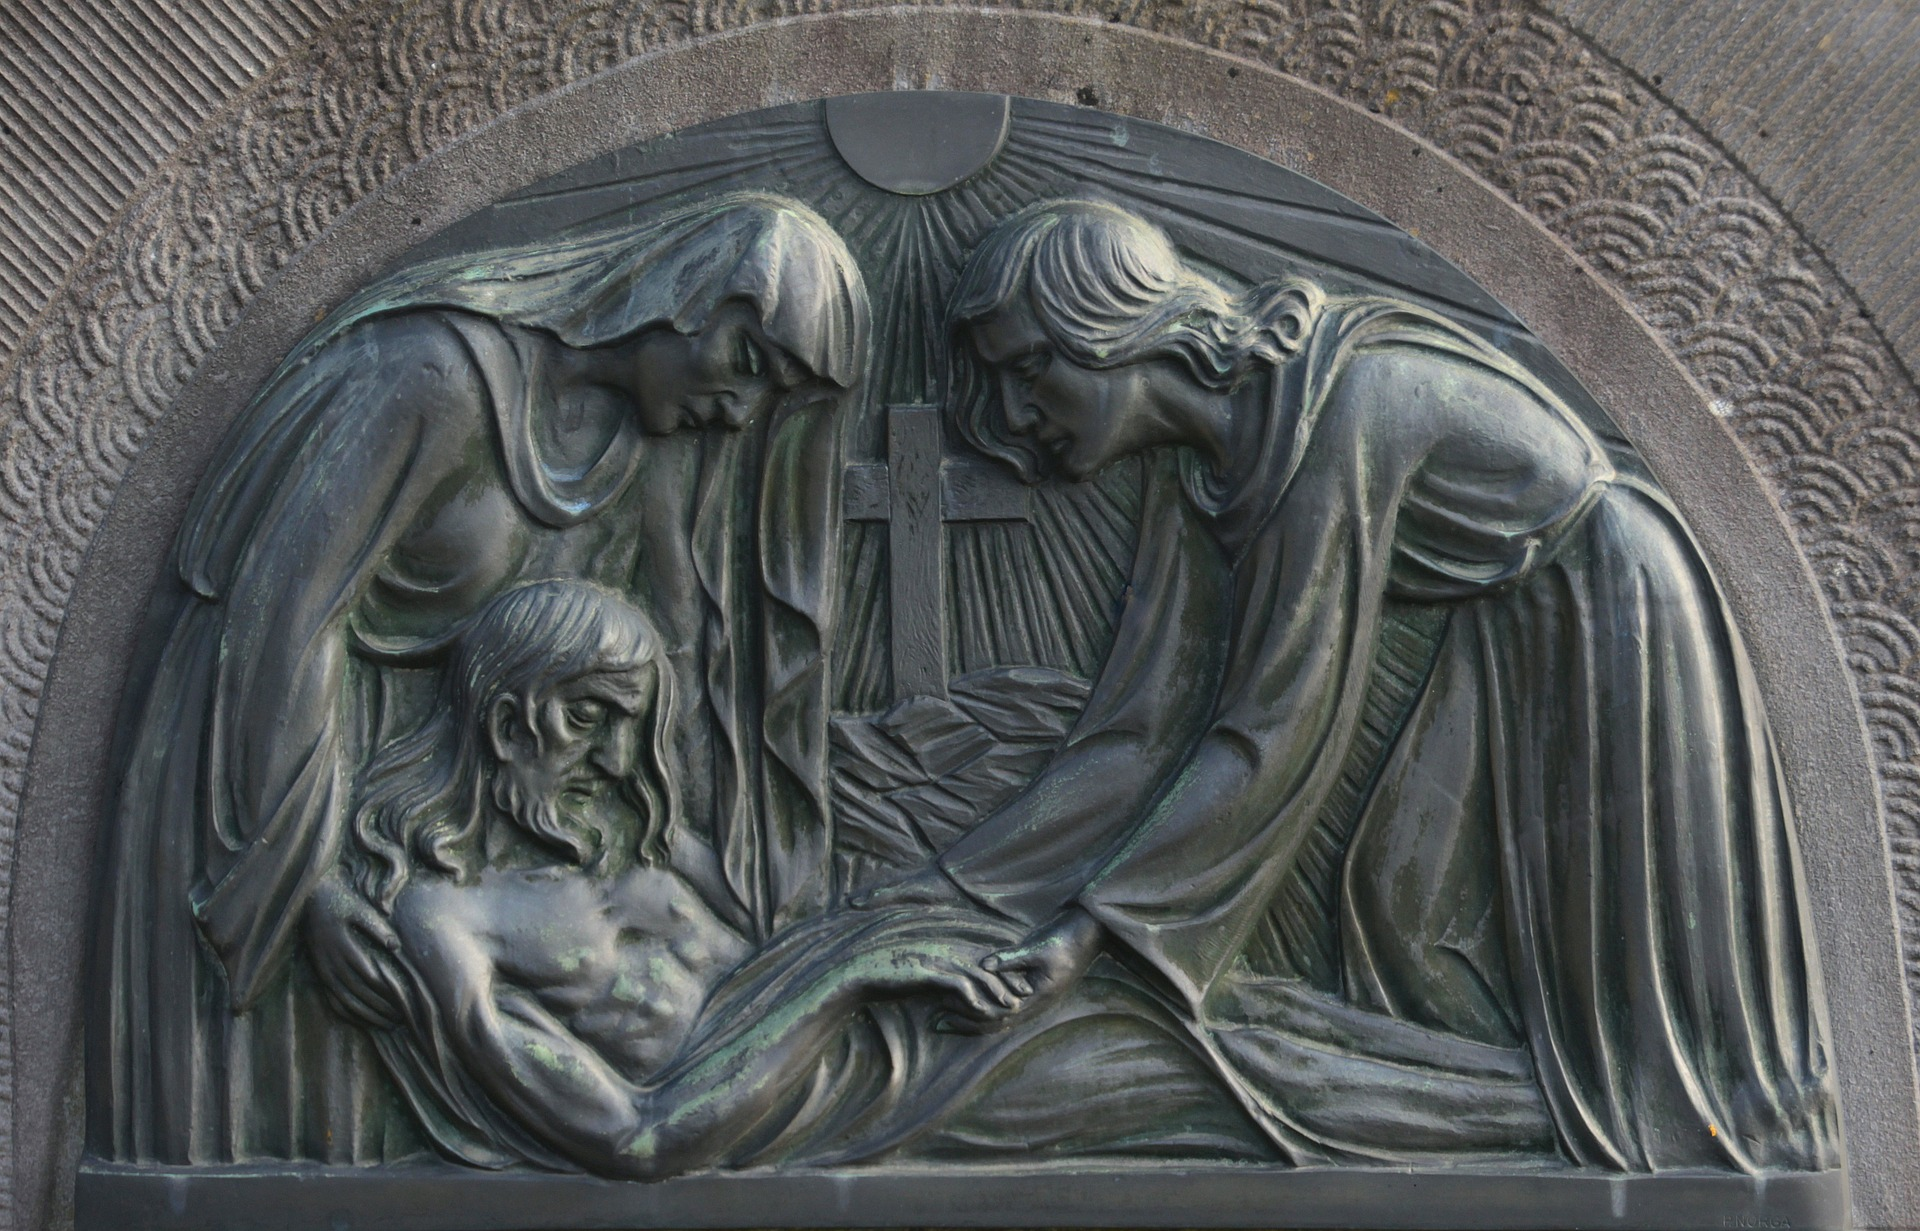 Jesus Sculpture, Fig, Figure, Jesus, Object, HQ Photo